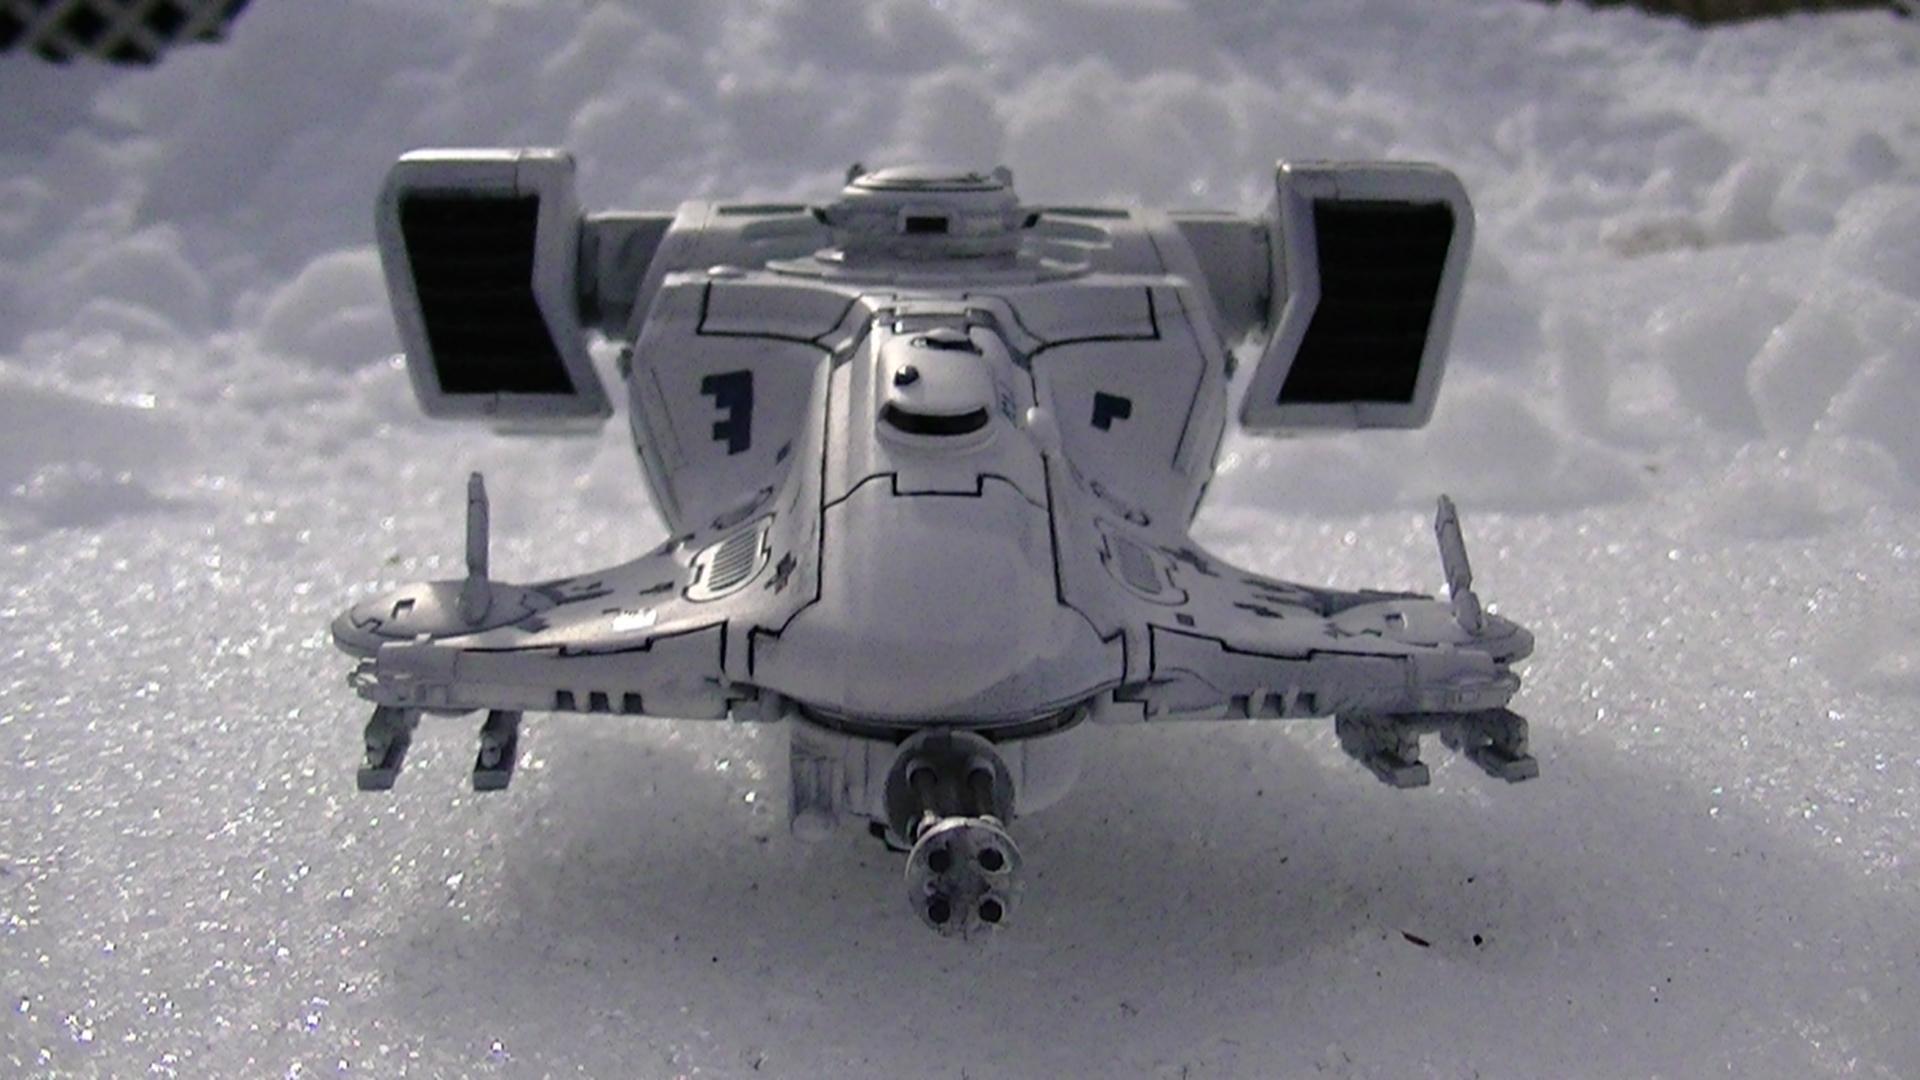 Apc, Burst Cannon, Camouflage, Devilfish, Digital, Drone, Drones, Hover Tank, Tank, Tau, Winter